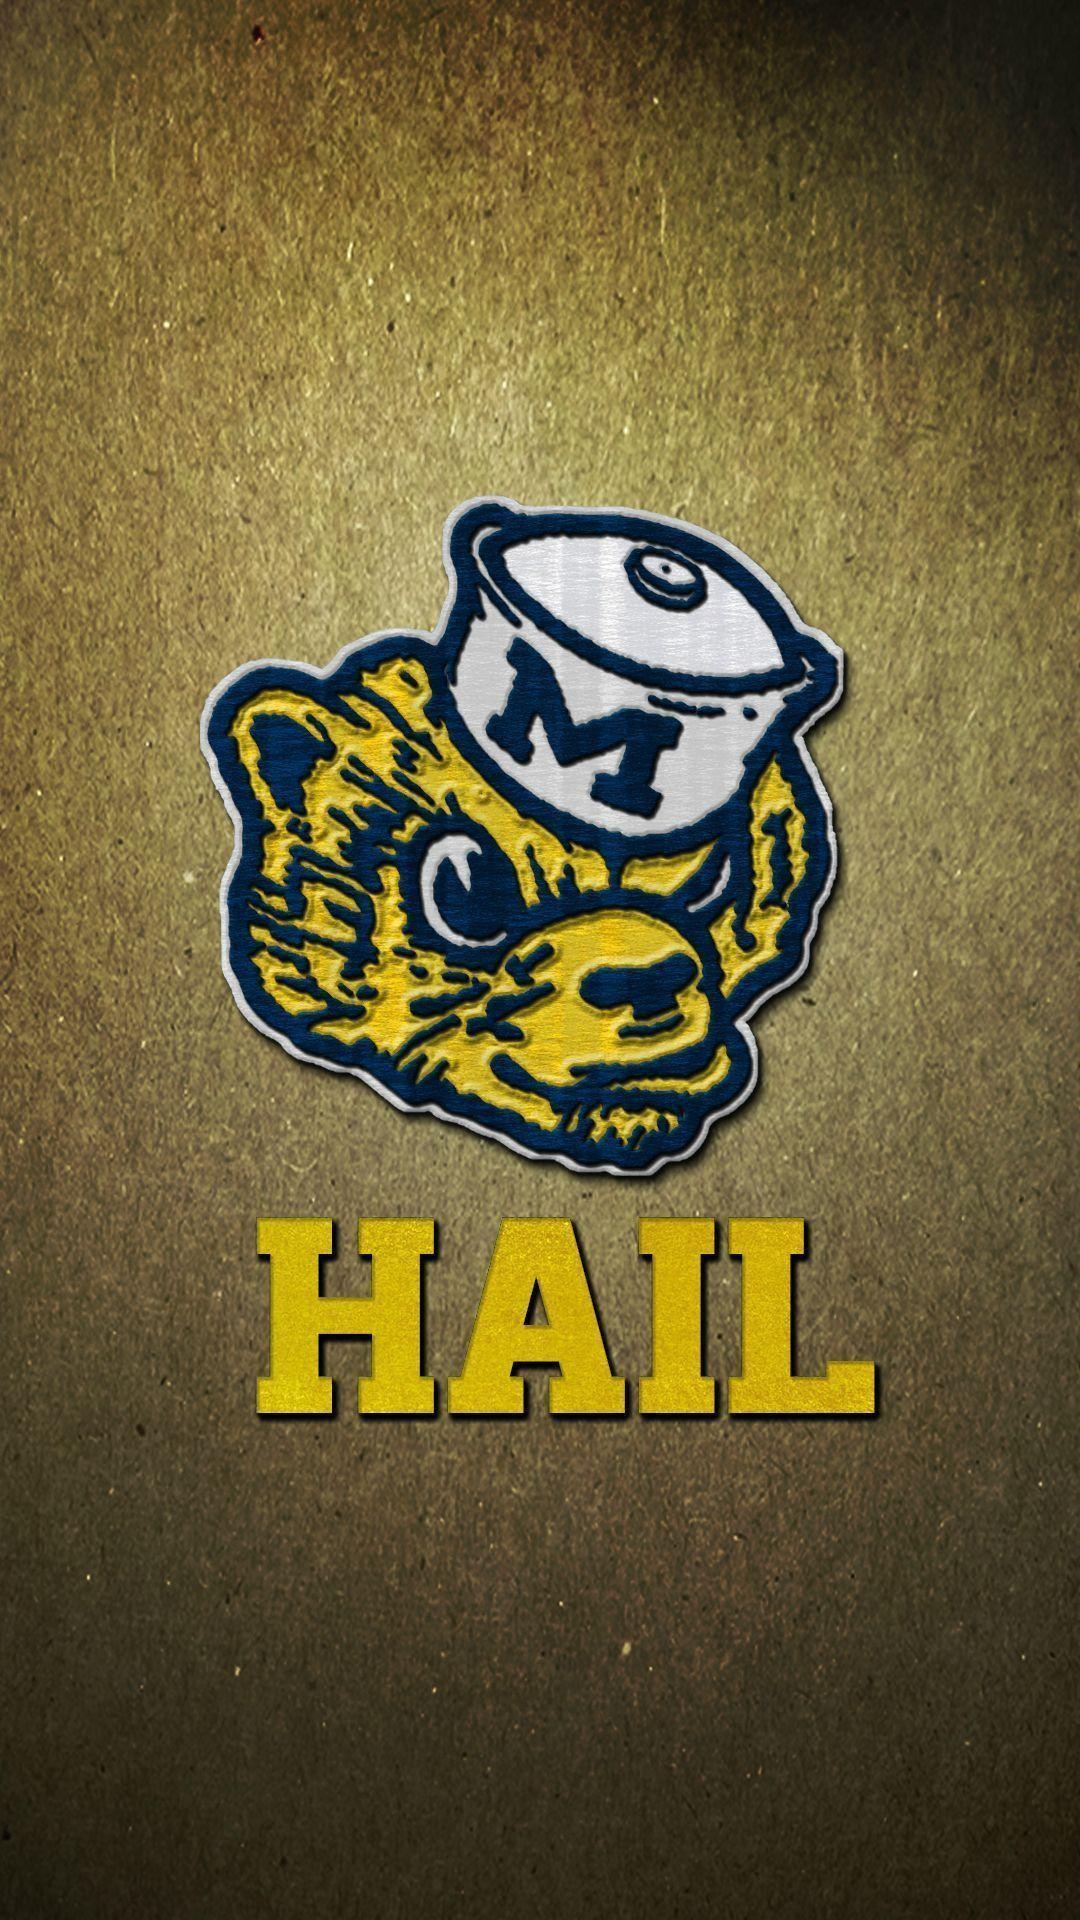 University of Michigan Football Wallpaper | SuperSweet Football .